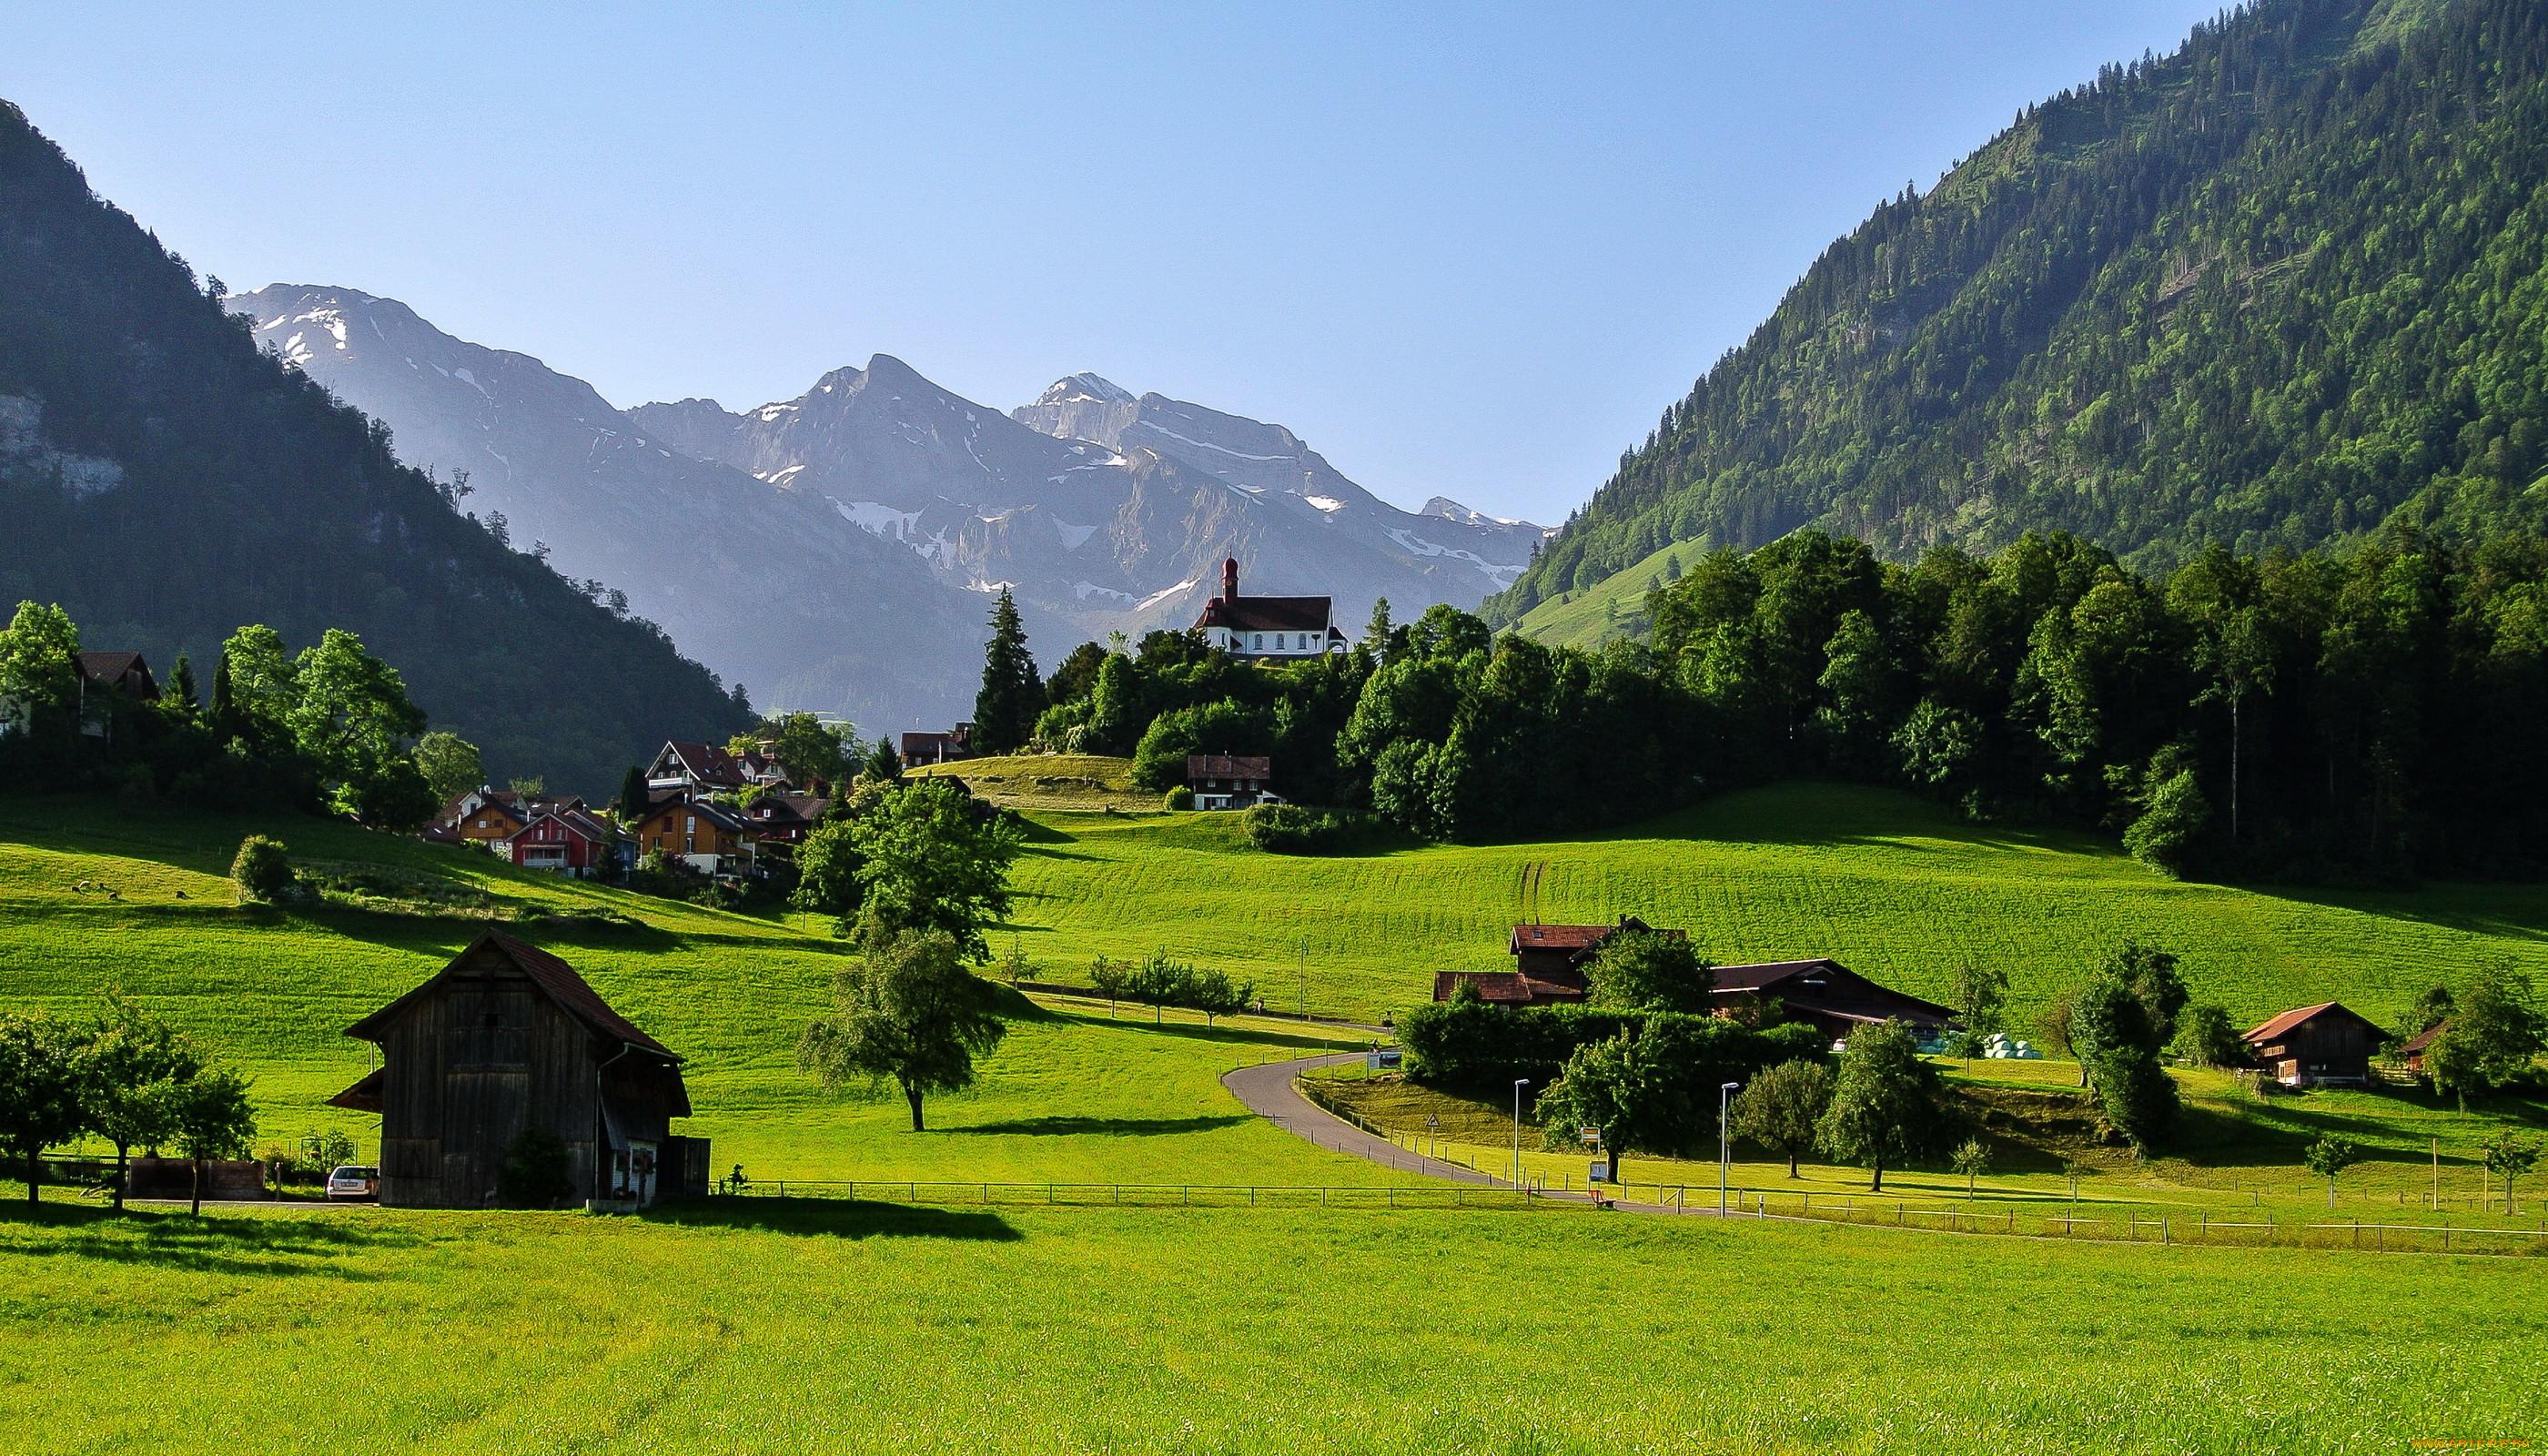 Обои дома, швейцария. Пейзажи foto 13